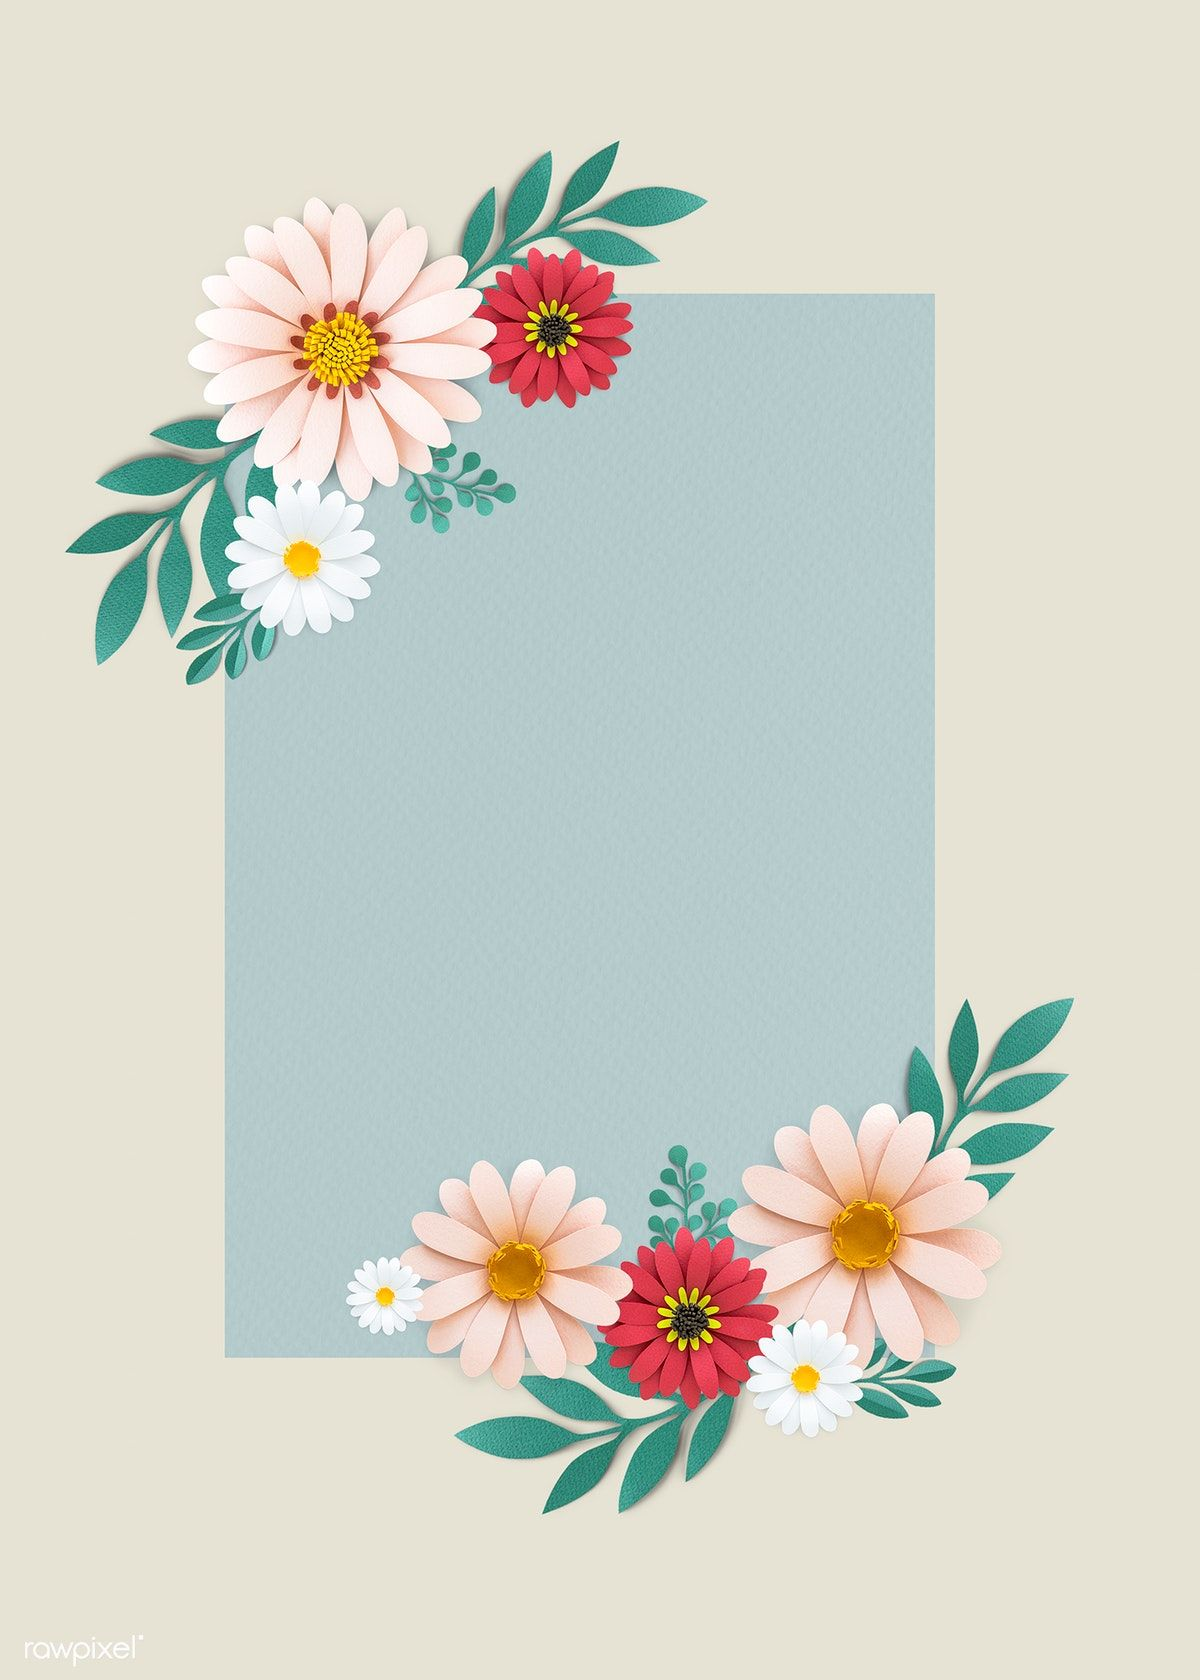 Design Trends Premium Psd Vector Downloads: Download Premium Psd Of Blooming Floral Frame Design Vector 1202558 In 2020